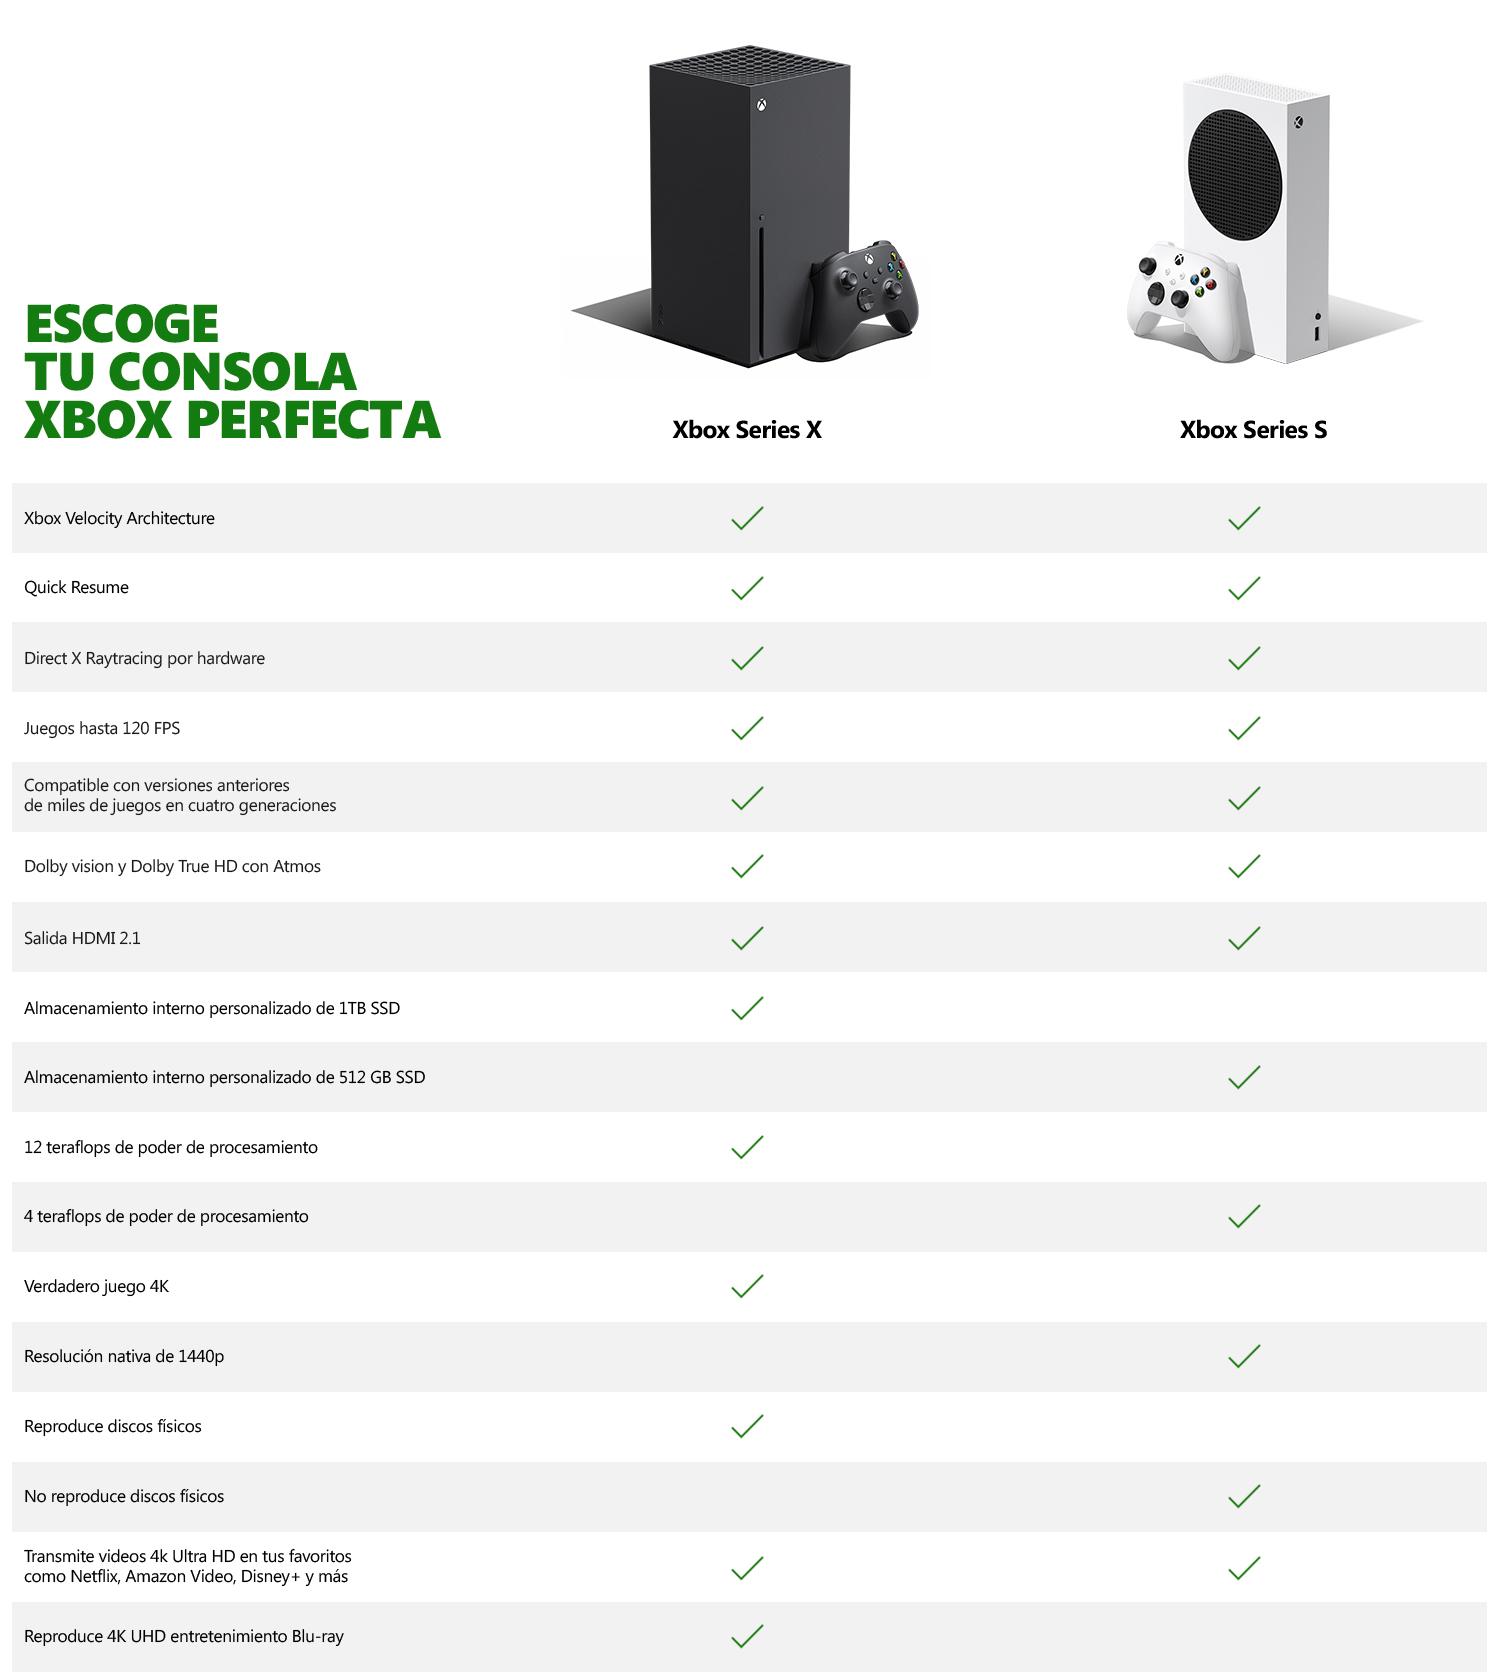 Escoge tu consola Xbox Perfecta